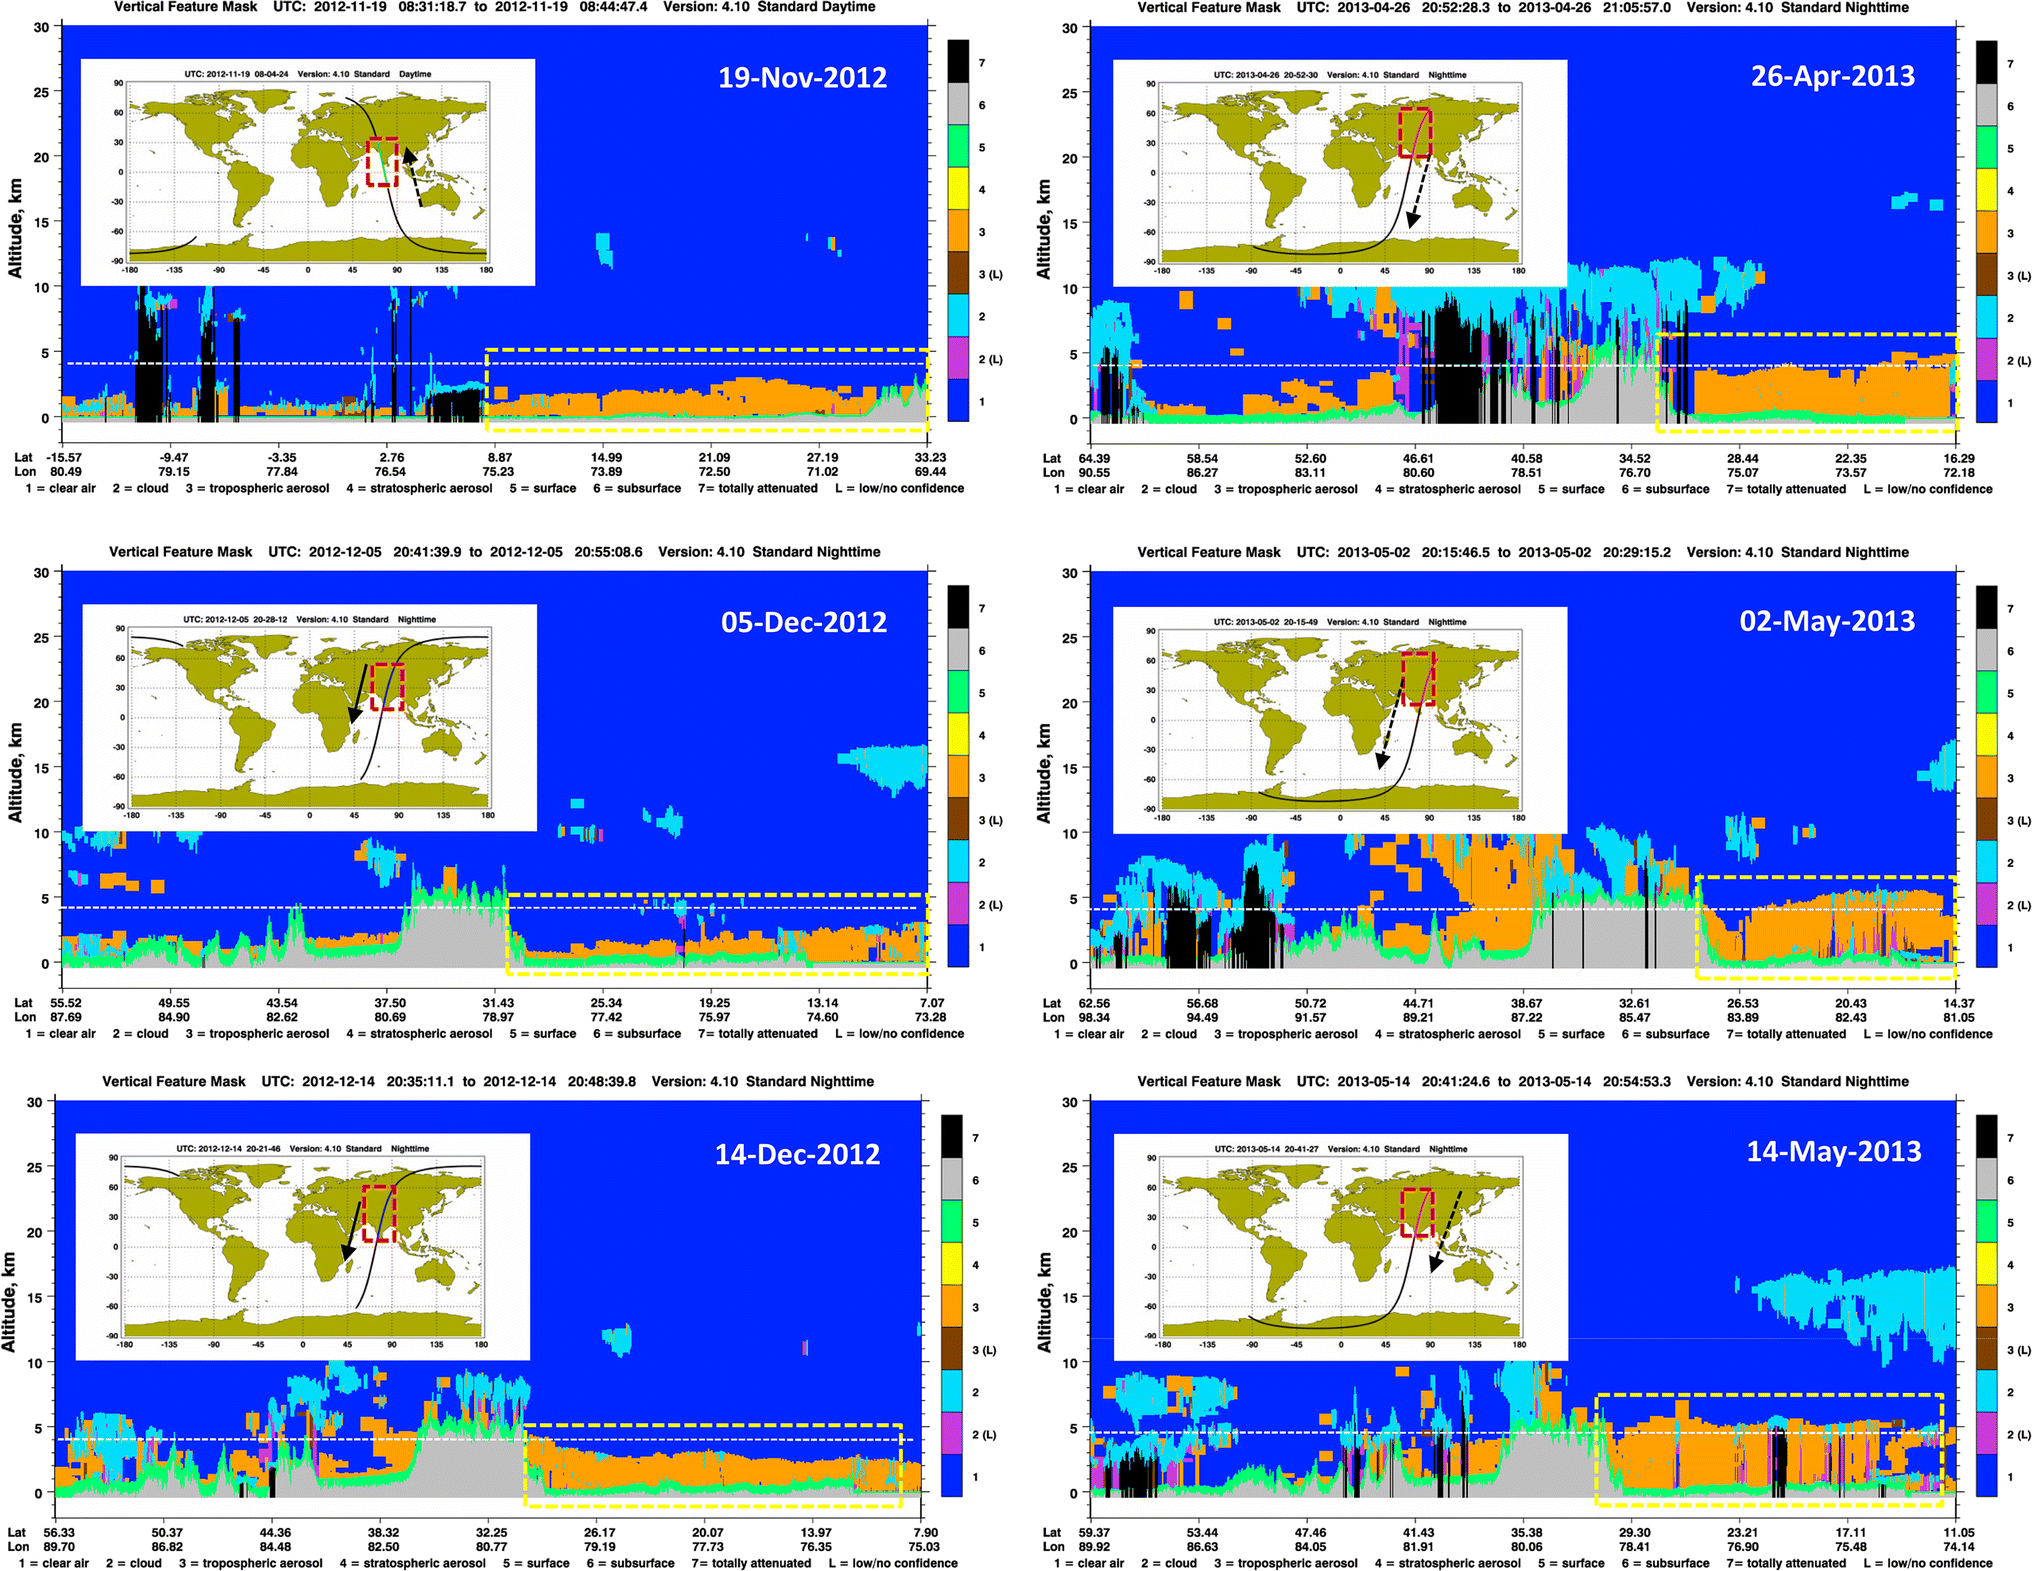 Seasonal contrast in the vertical profiles of aerosol number